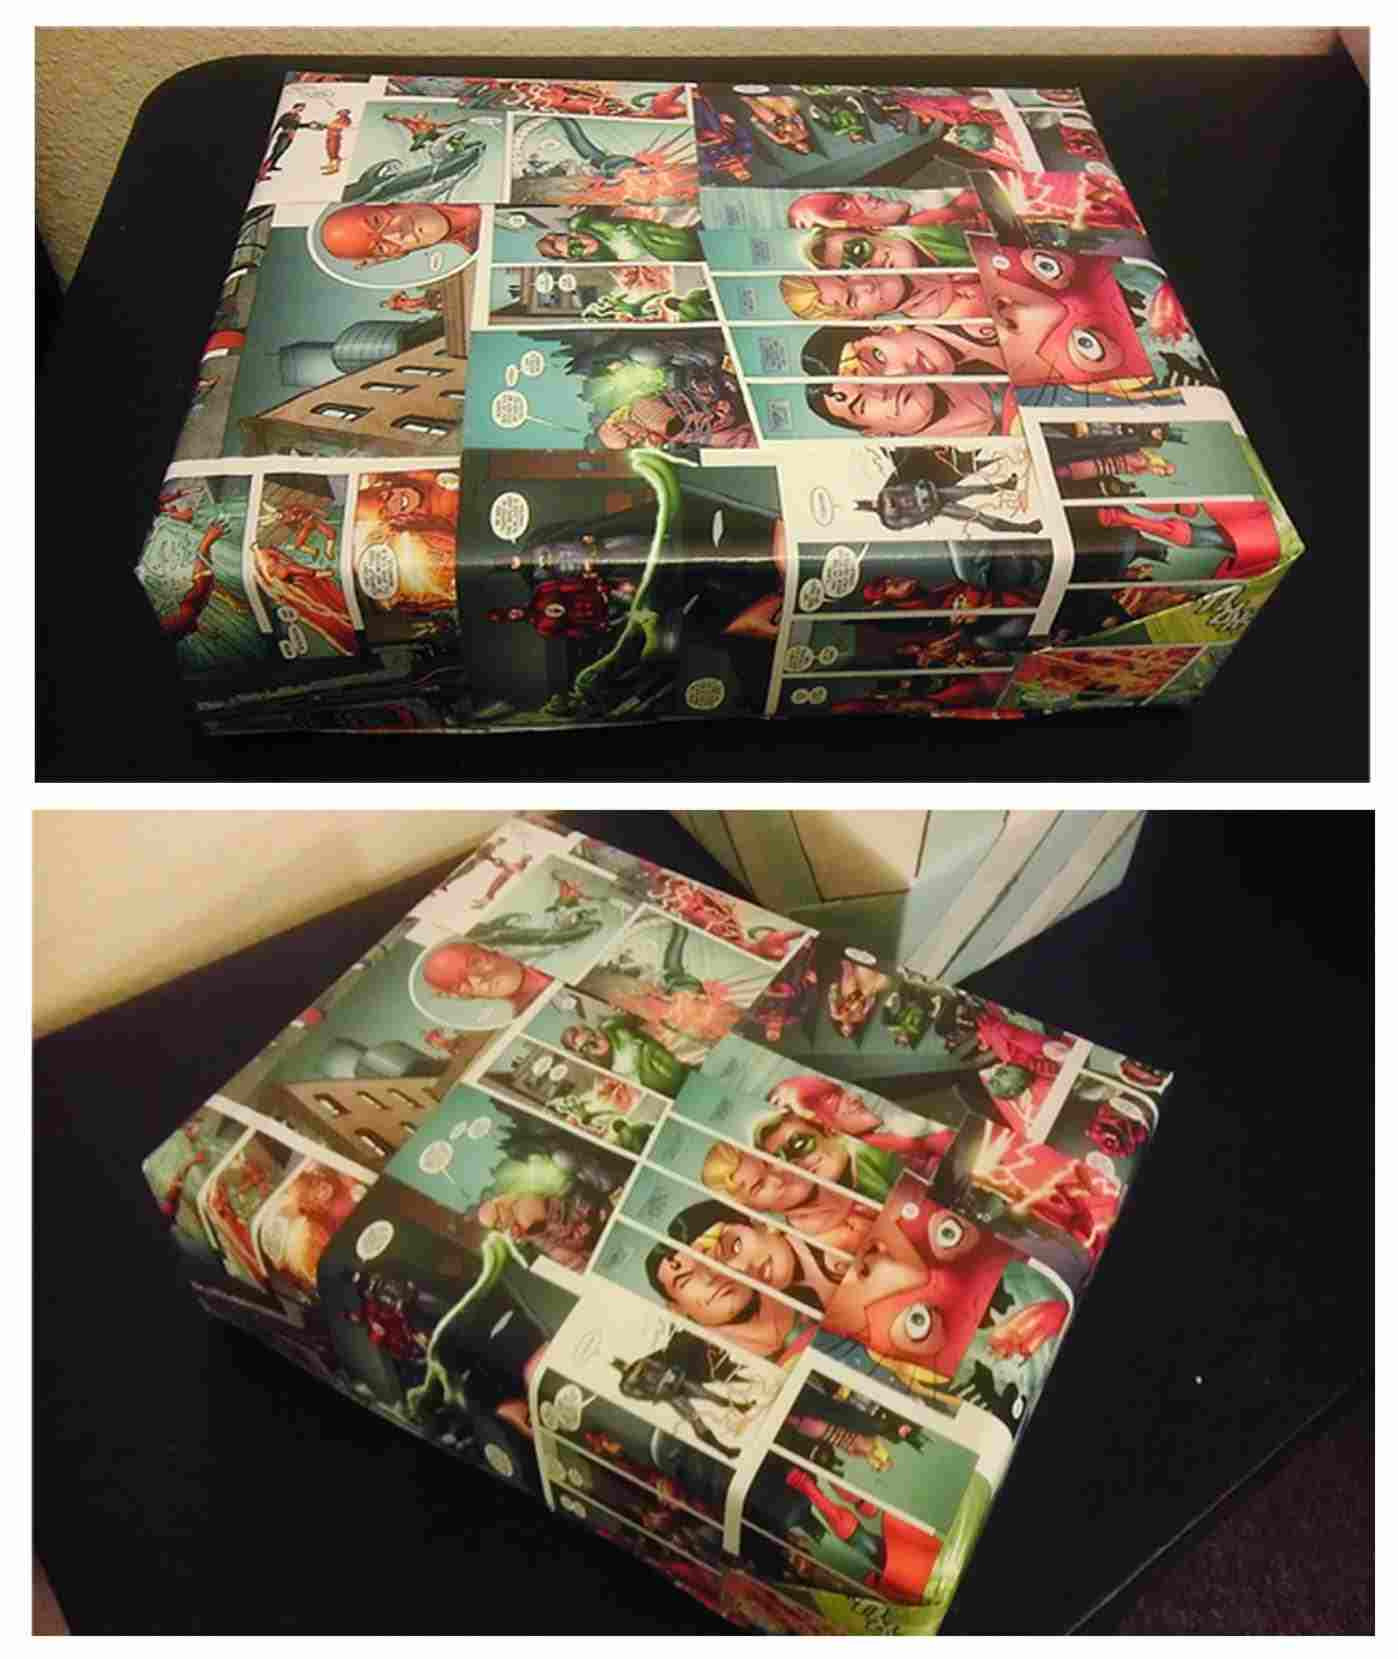 One Year Anniversary Gift Ideas For Boyfriend  diy 1 year anniversary ts for boyfriend